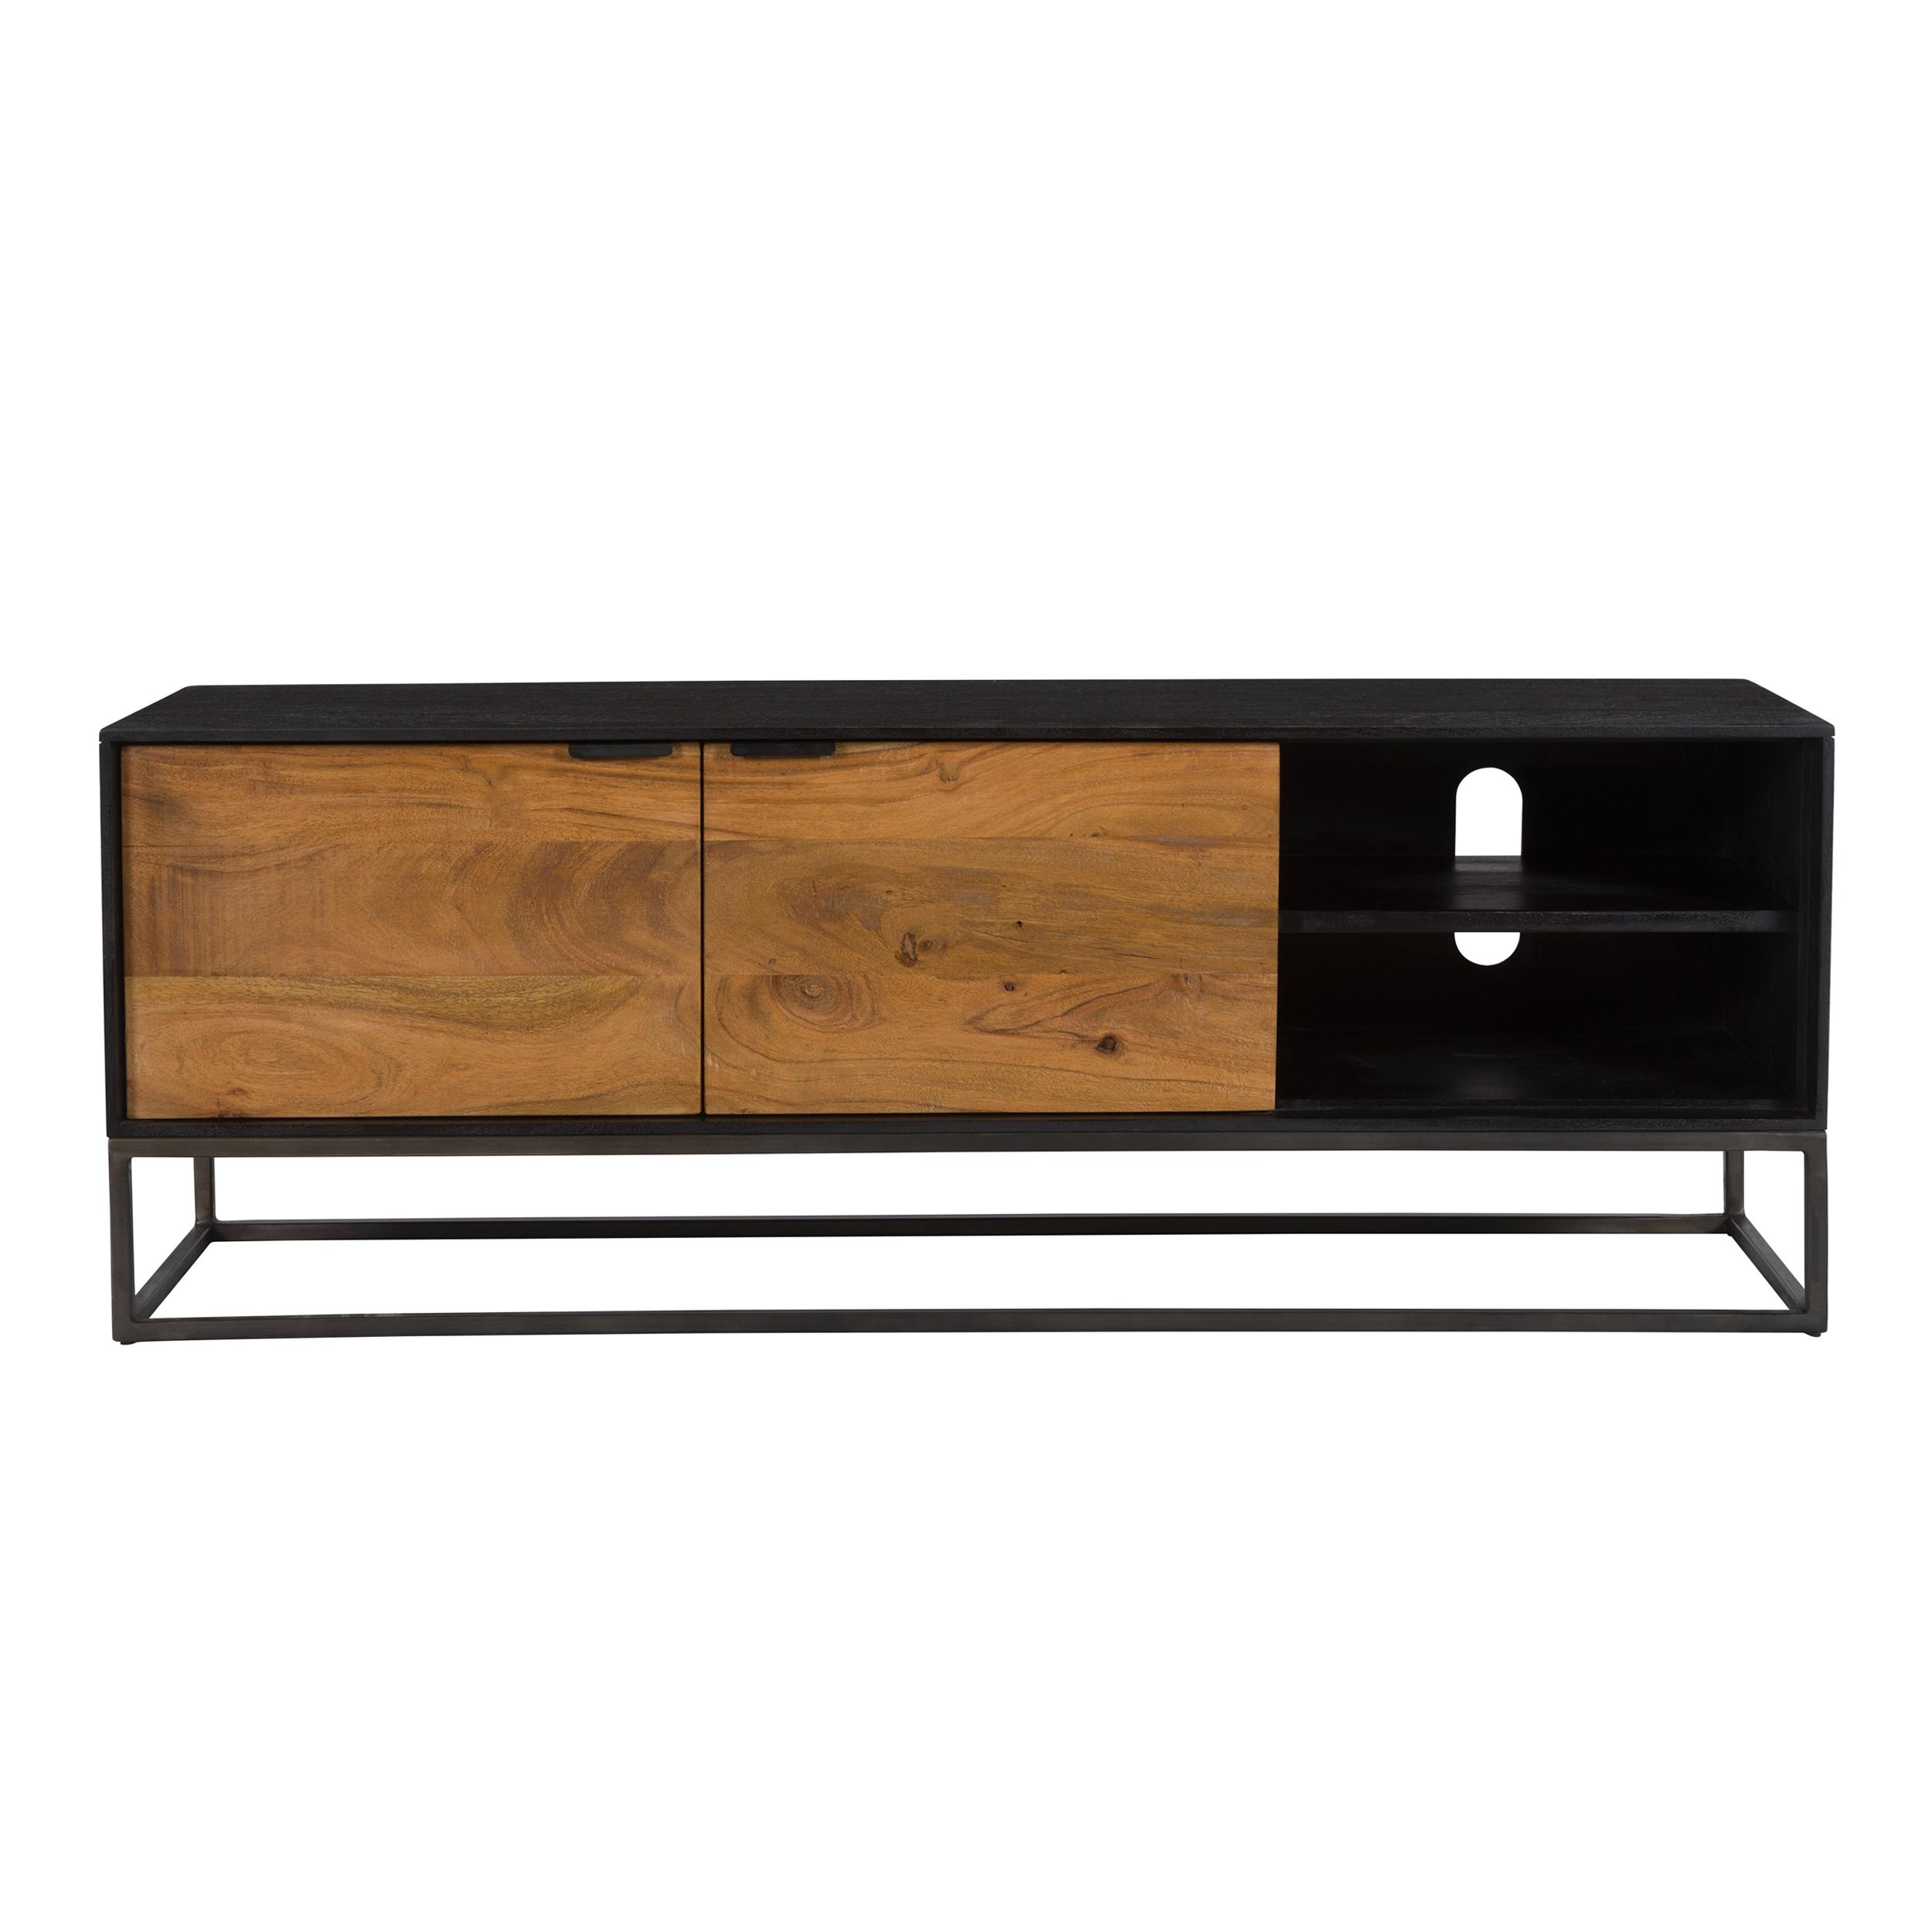 Meuble TV 2 portes 2 niches en bois d'acacia, pieds en métal